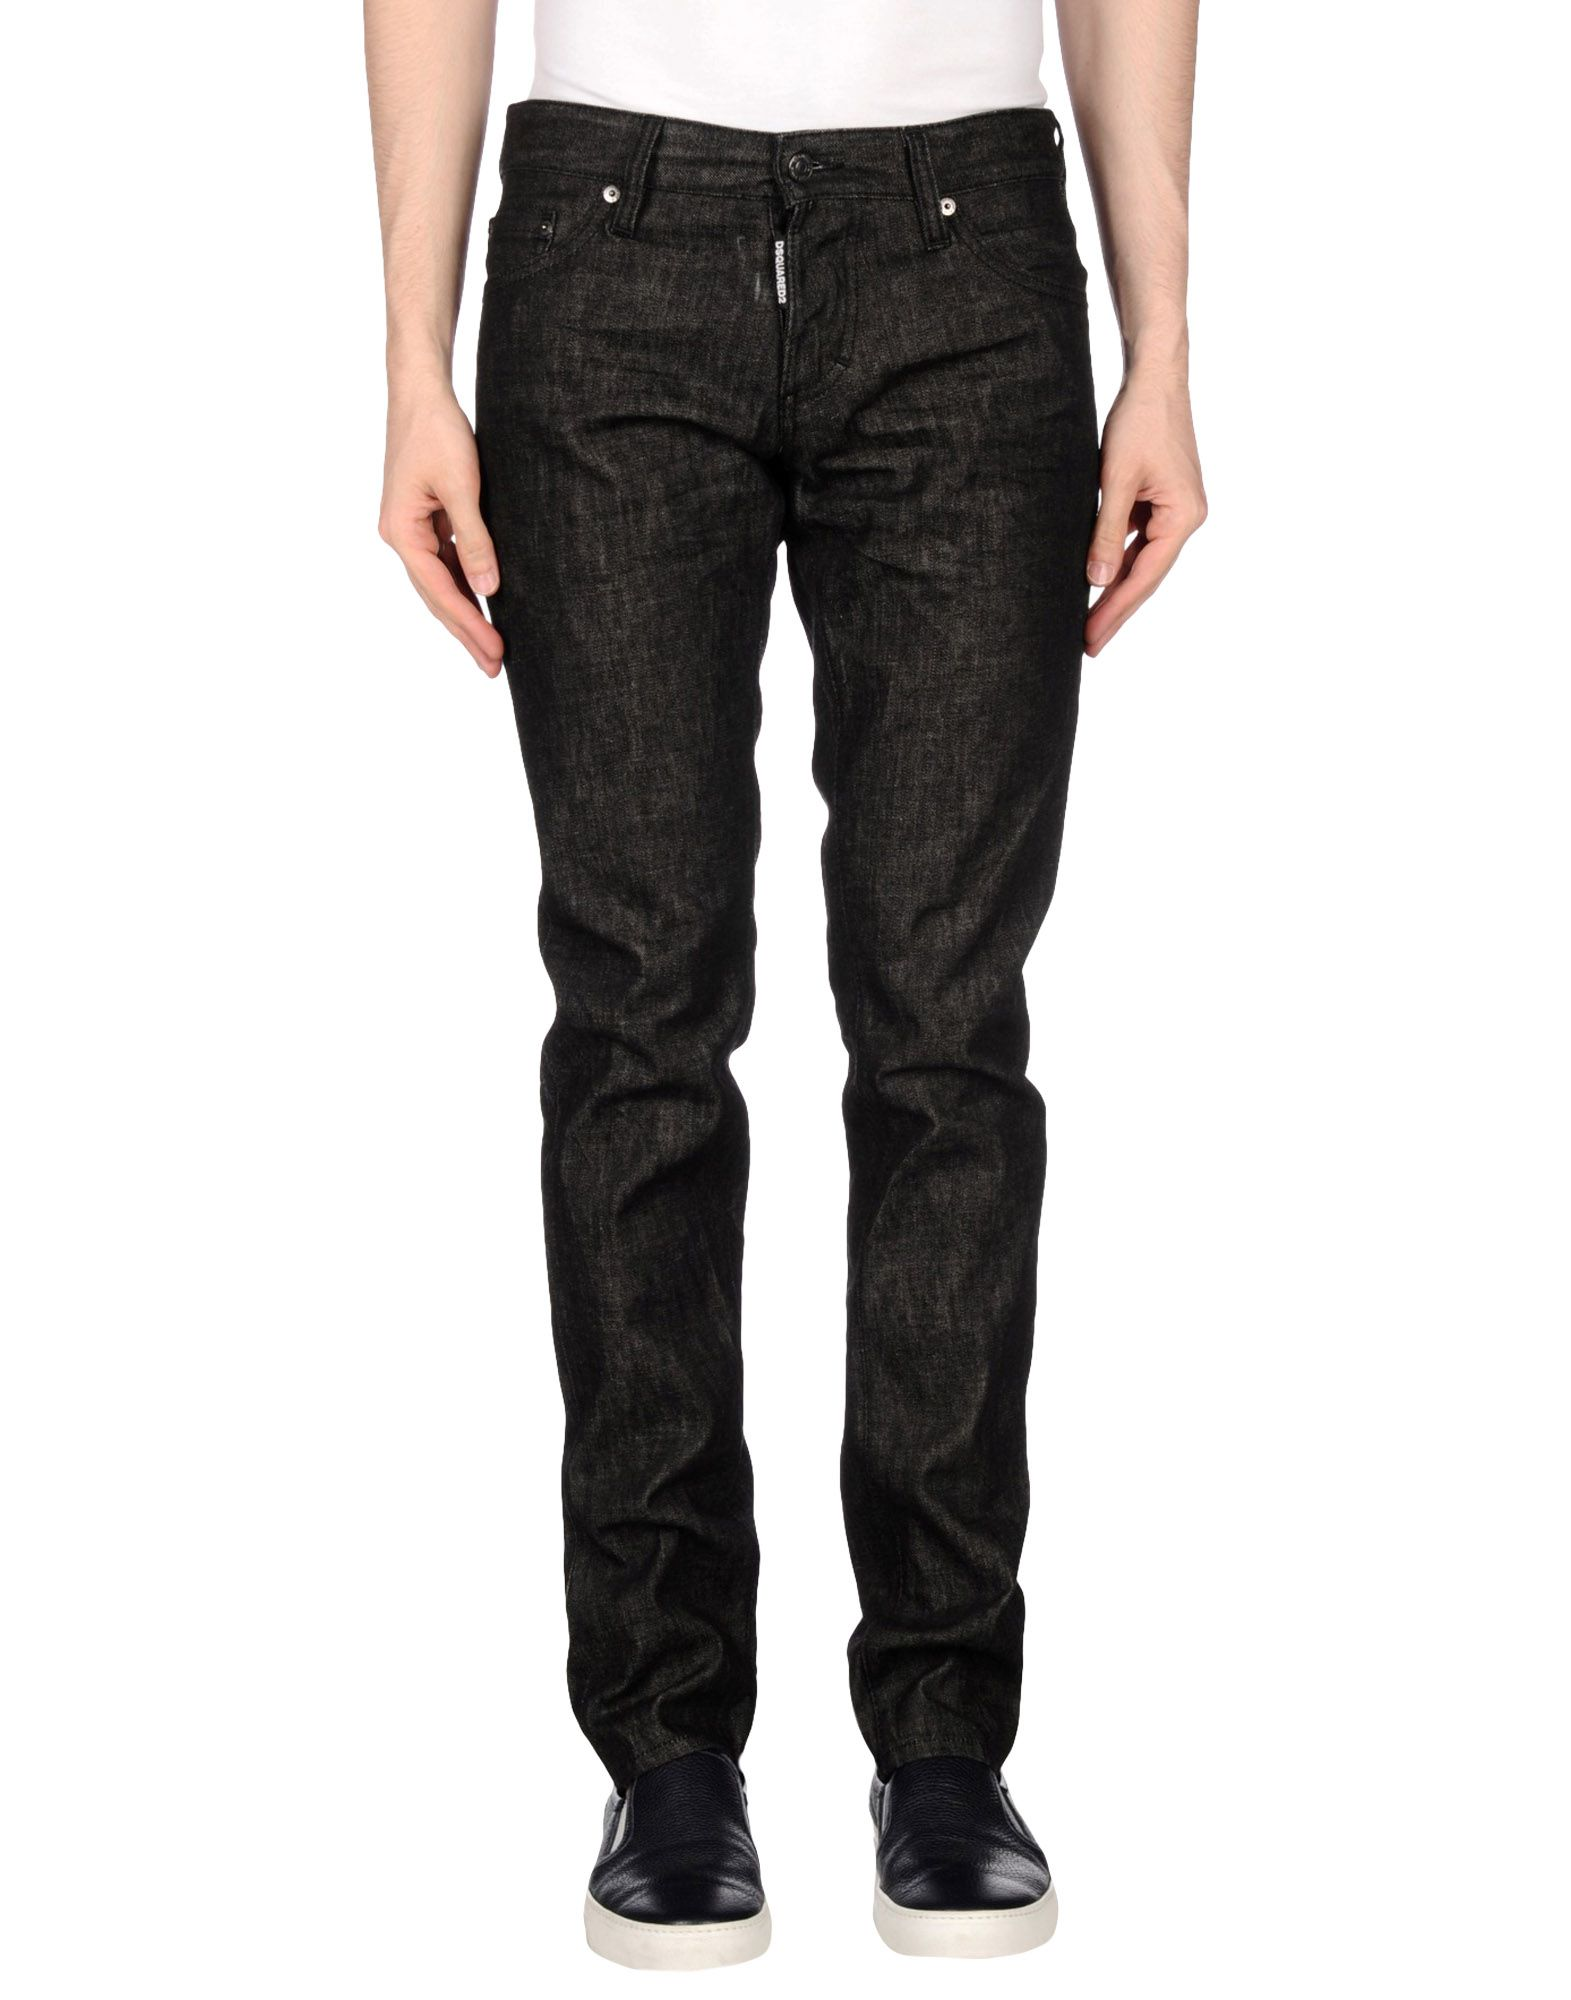 Pantaloni Uomo Jeans Dsquarosso2 Uomo Pantaloni - 42579423SO 917540